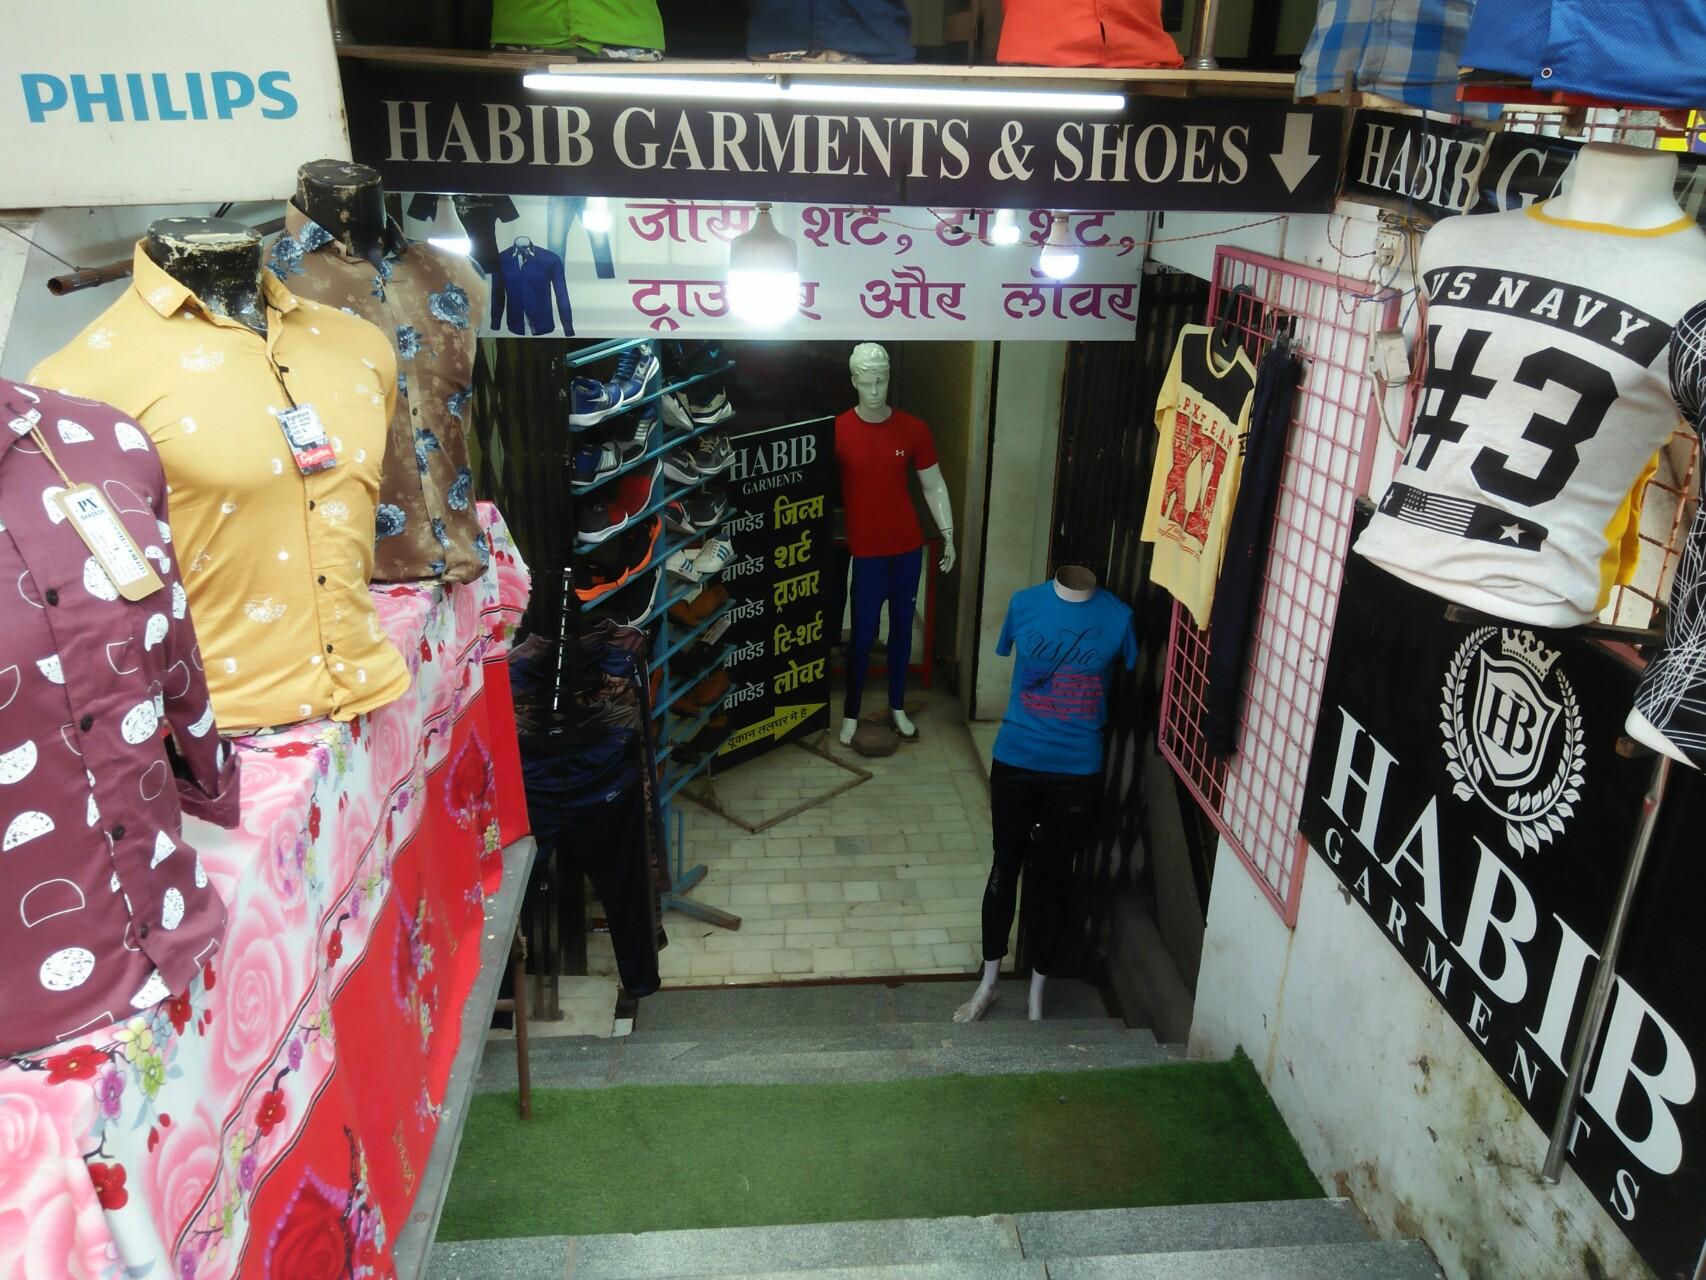 Habib garments